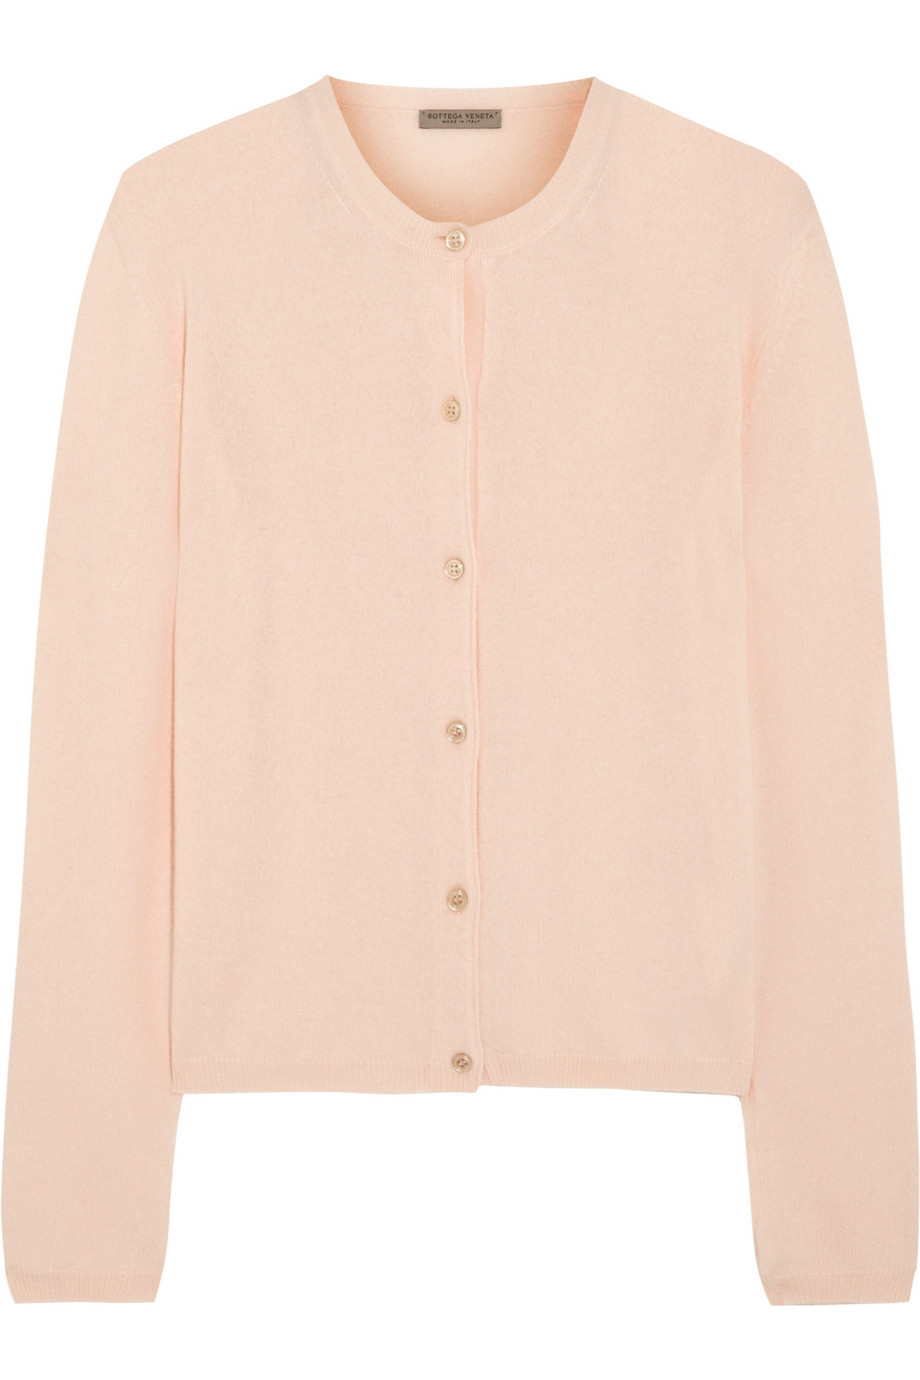 Bottega veneta Fine-Knit Cashmere Cardigan in Pink | Lyst